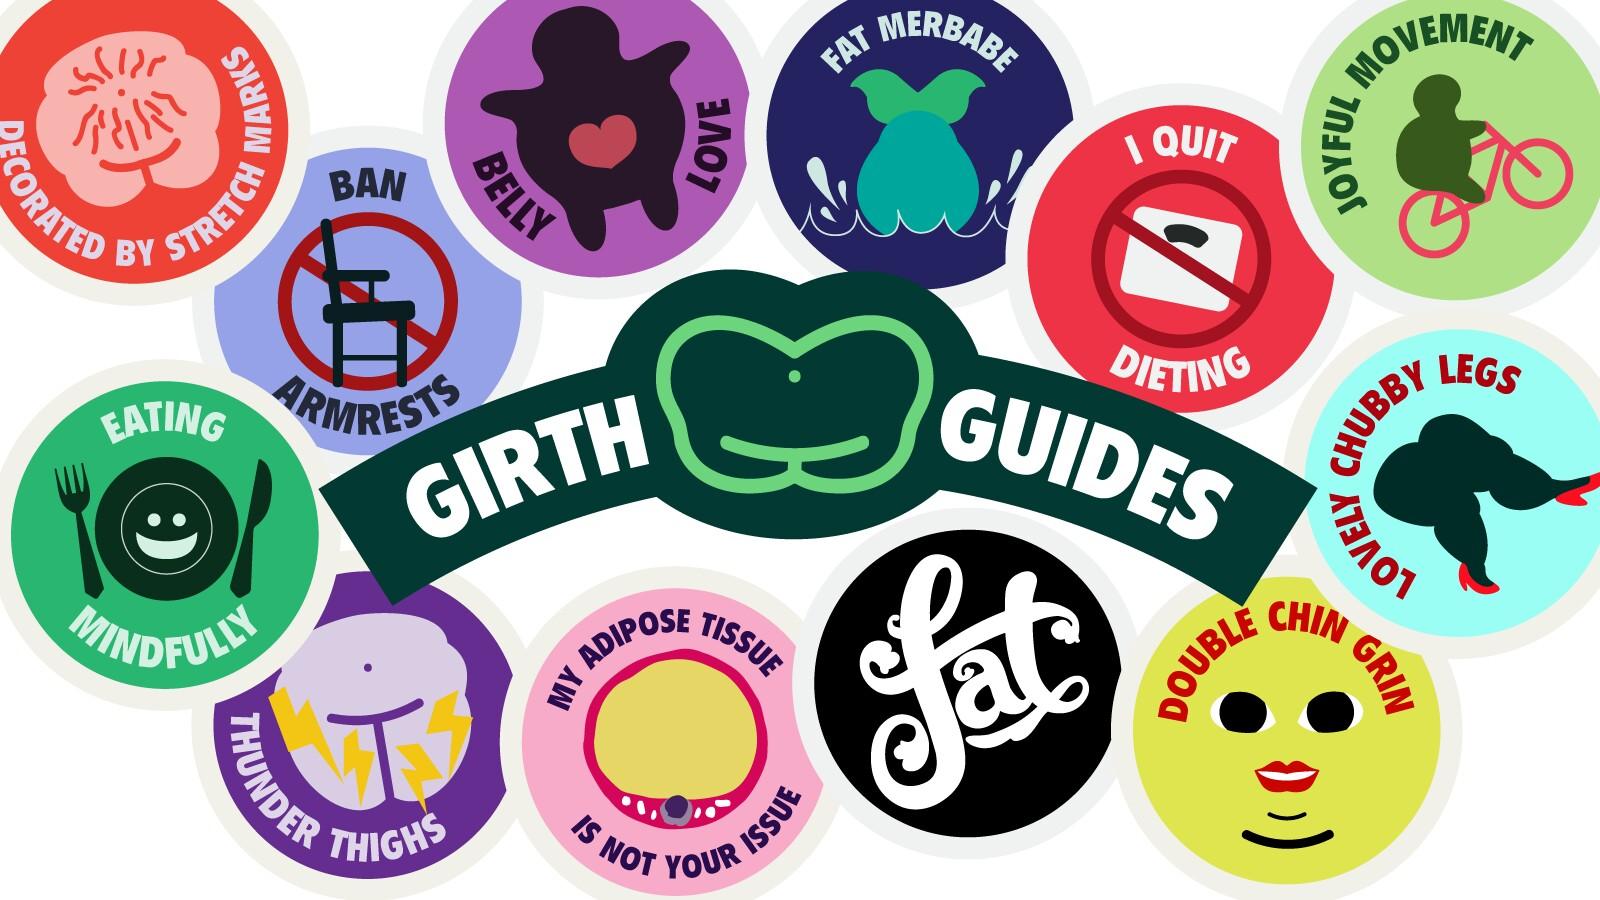 Vocal Girth Guides 2.jpg